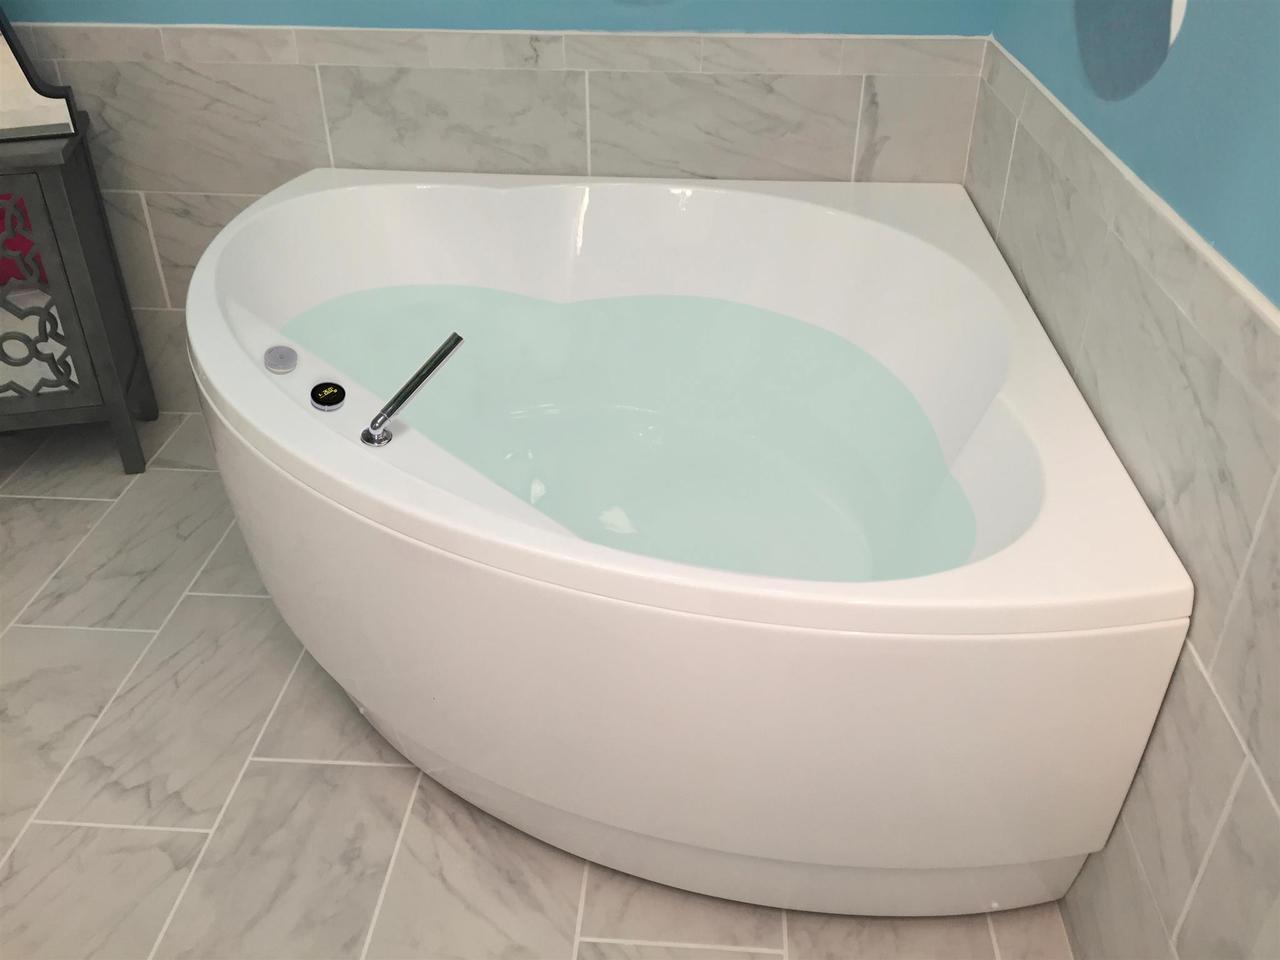 Cleopatra wht corner acrylic bathtub by Aquatica 01 1 (web)